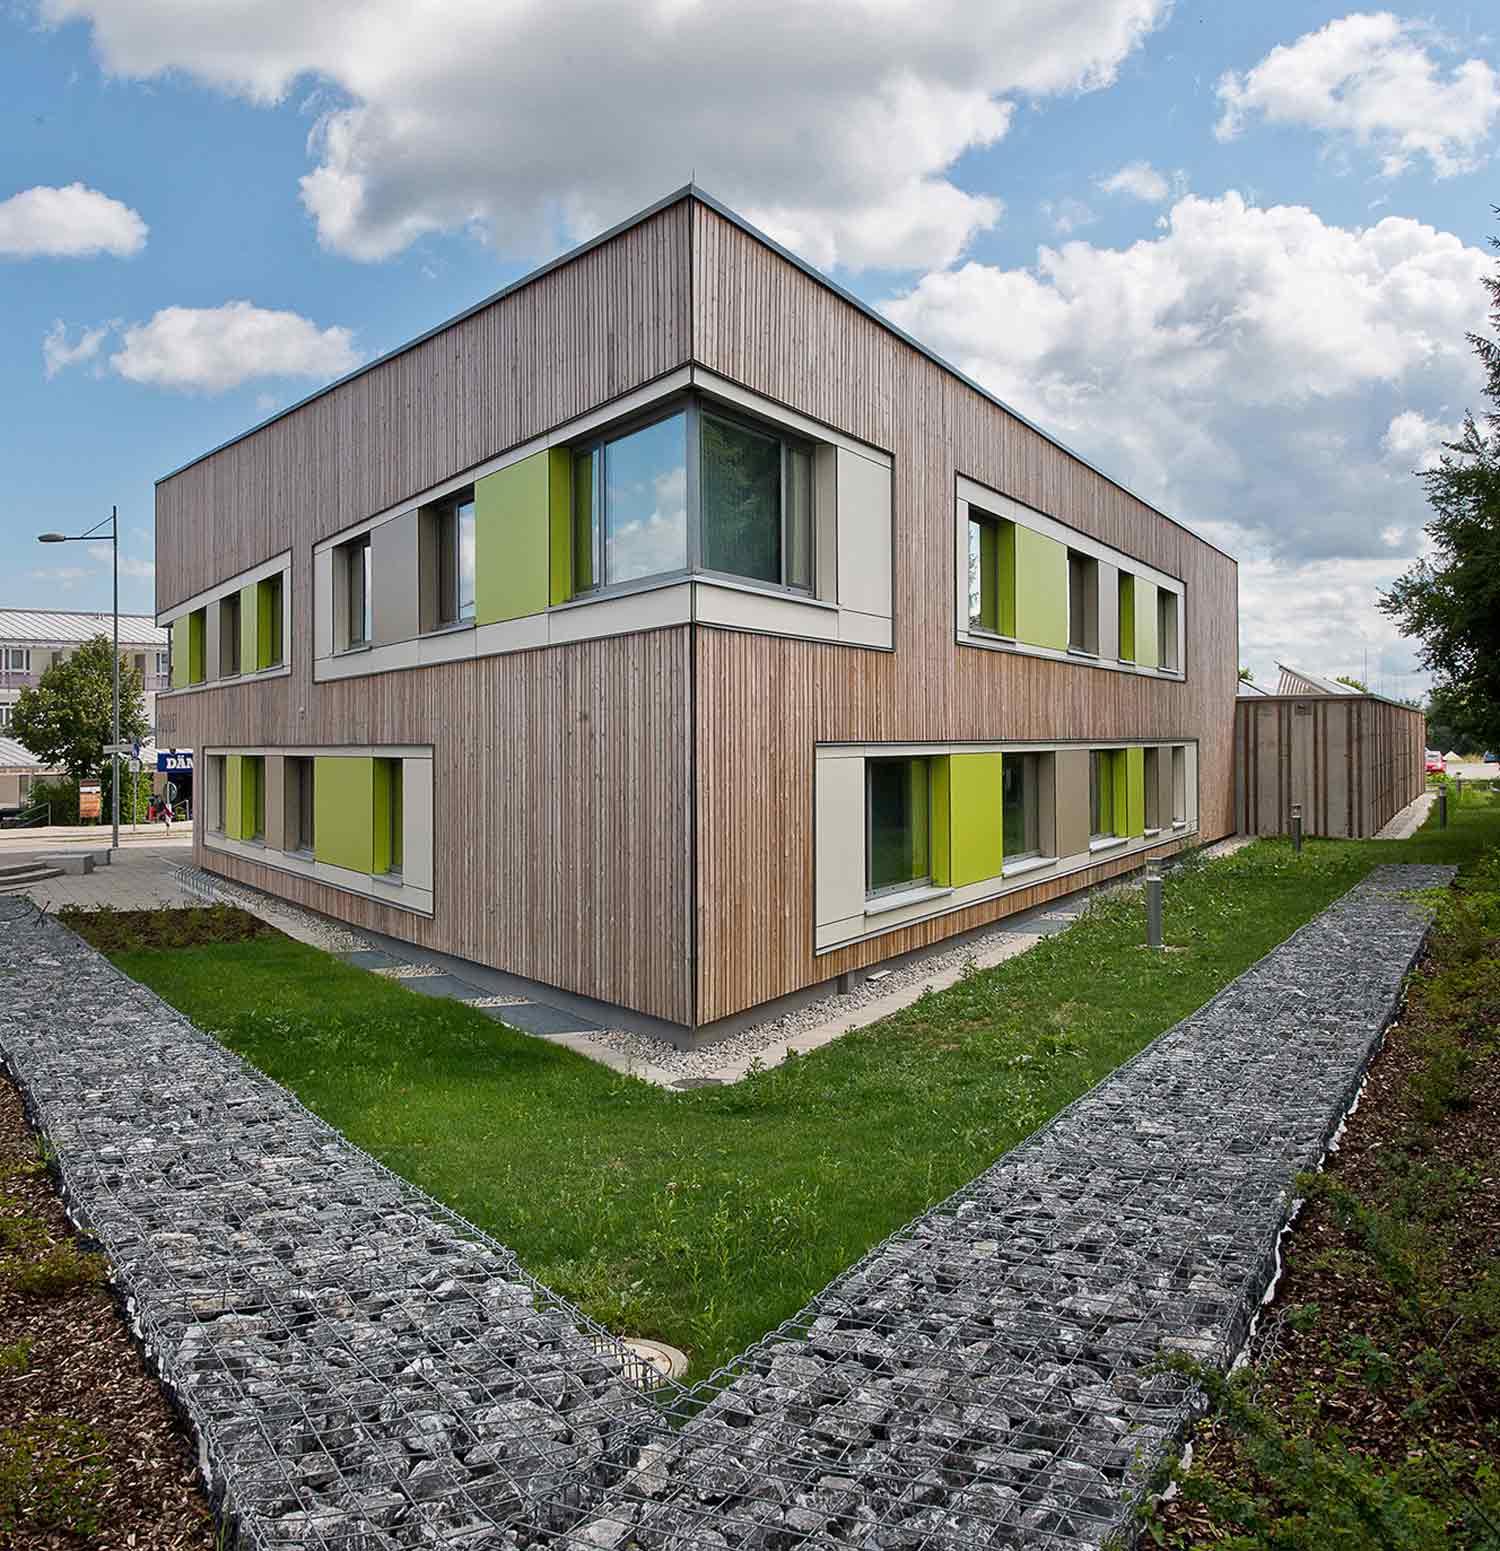 Ssp Planung GmbH